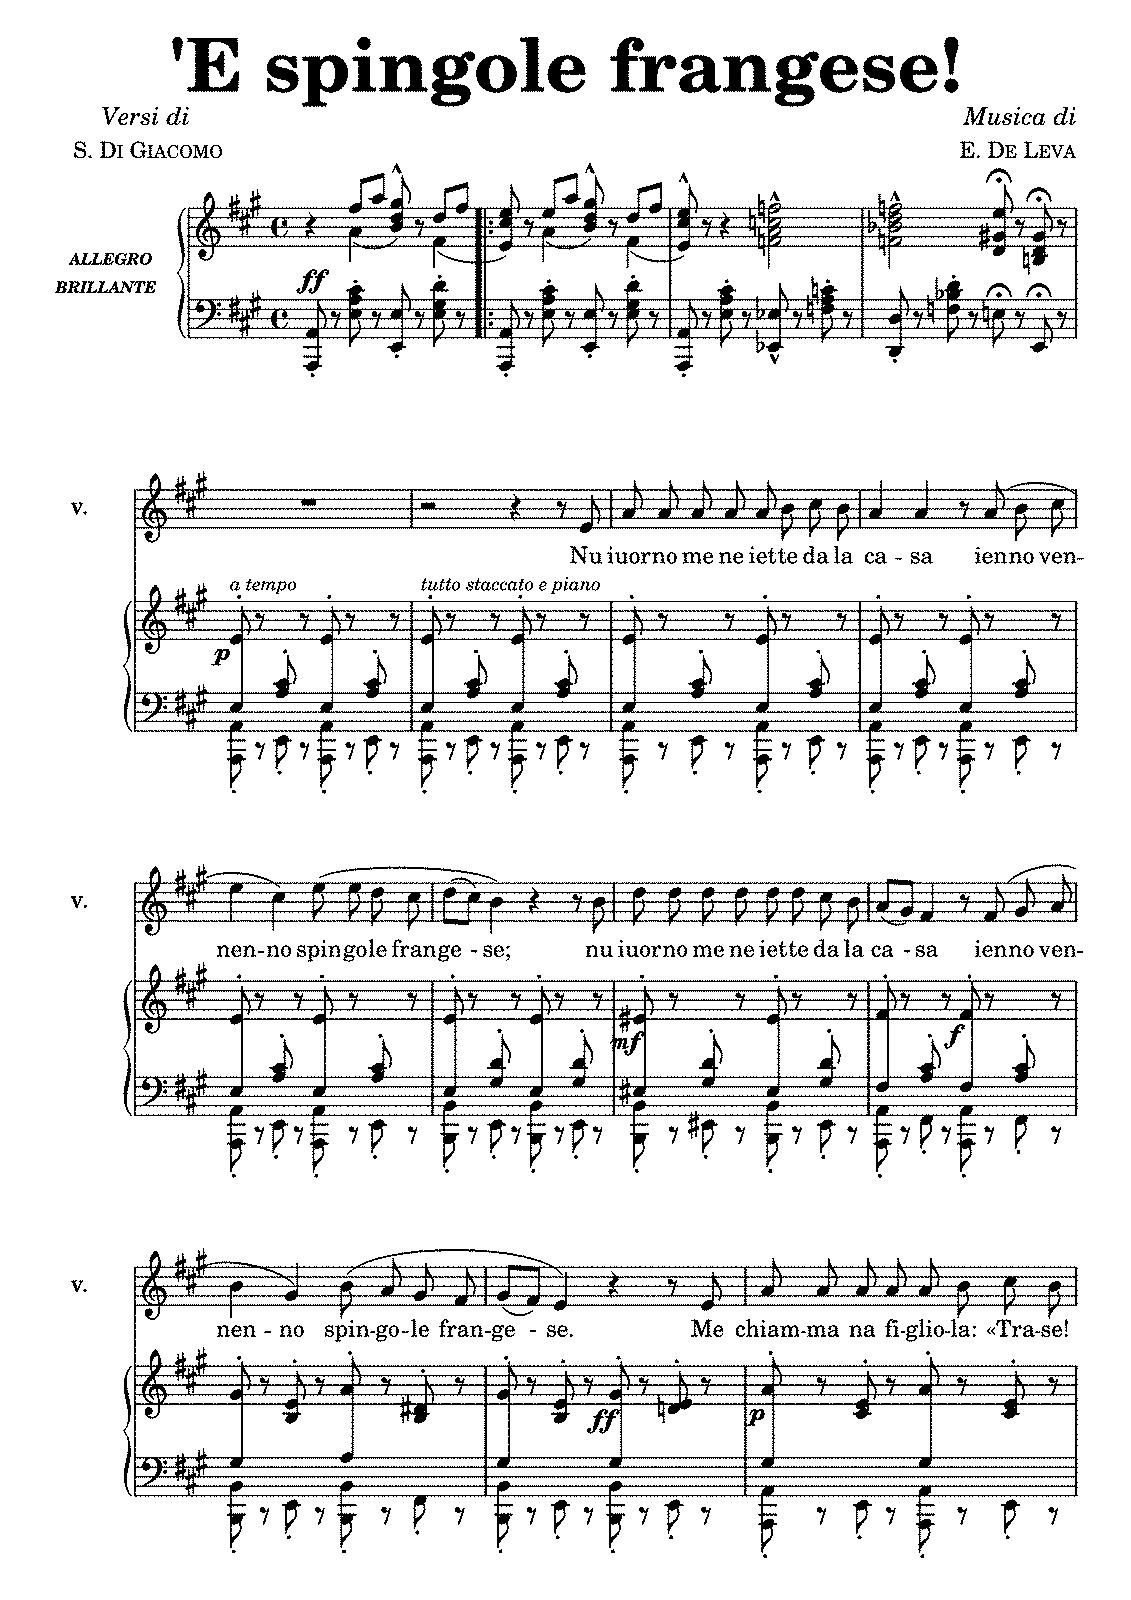 5 String Banjo Rolls